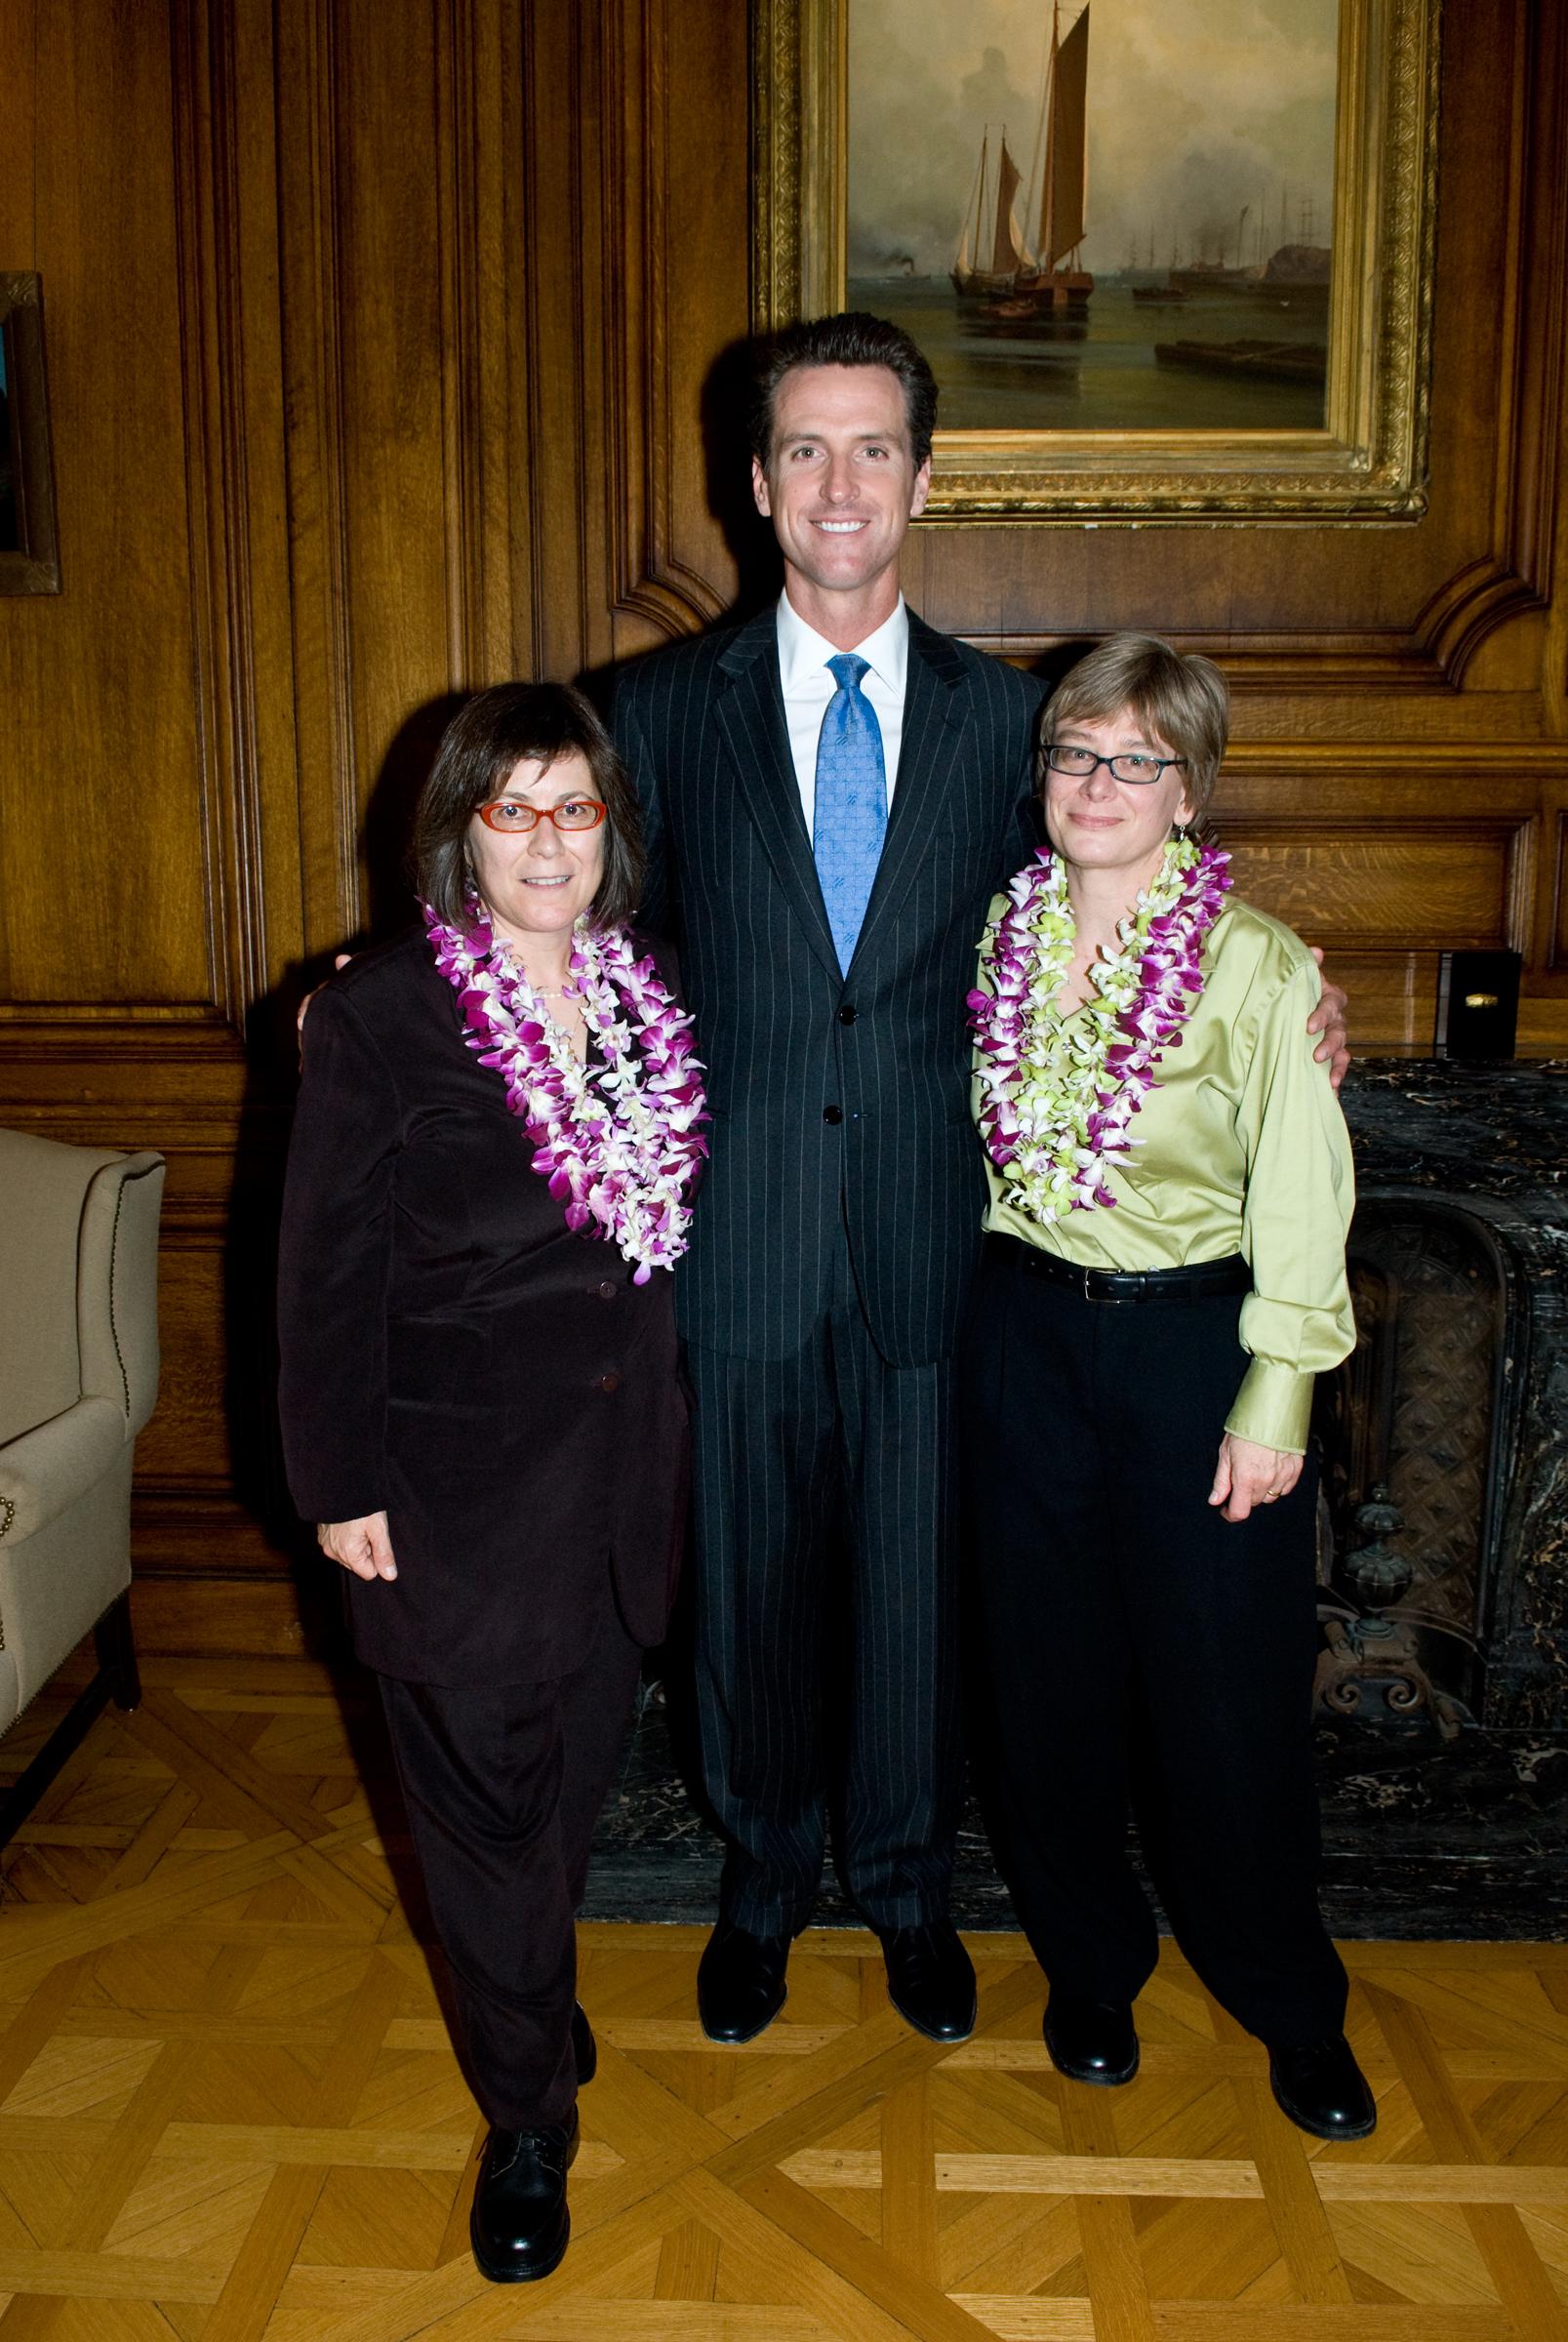 Shelly, Gavin, Kathy